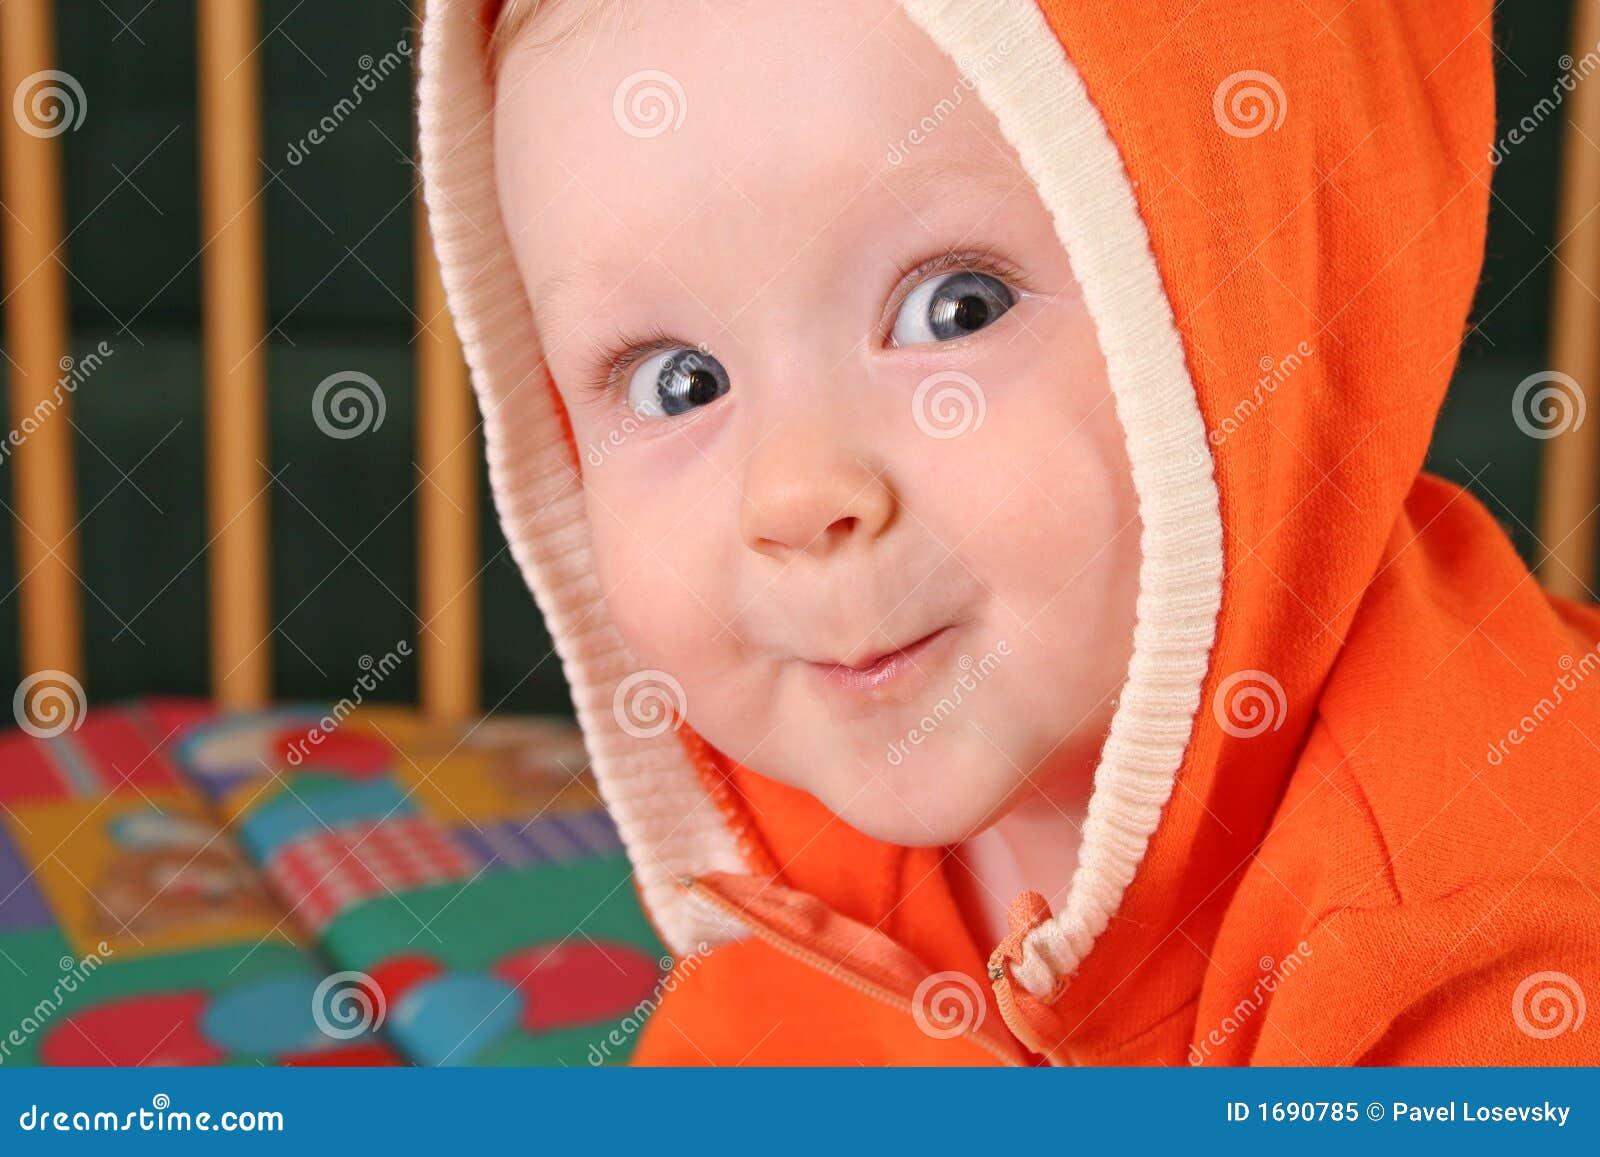 Baby boy with hood